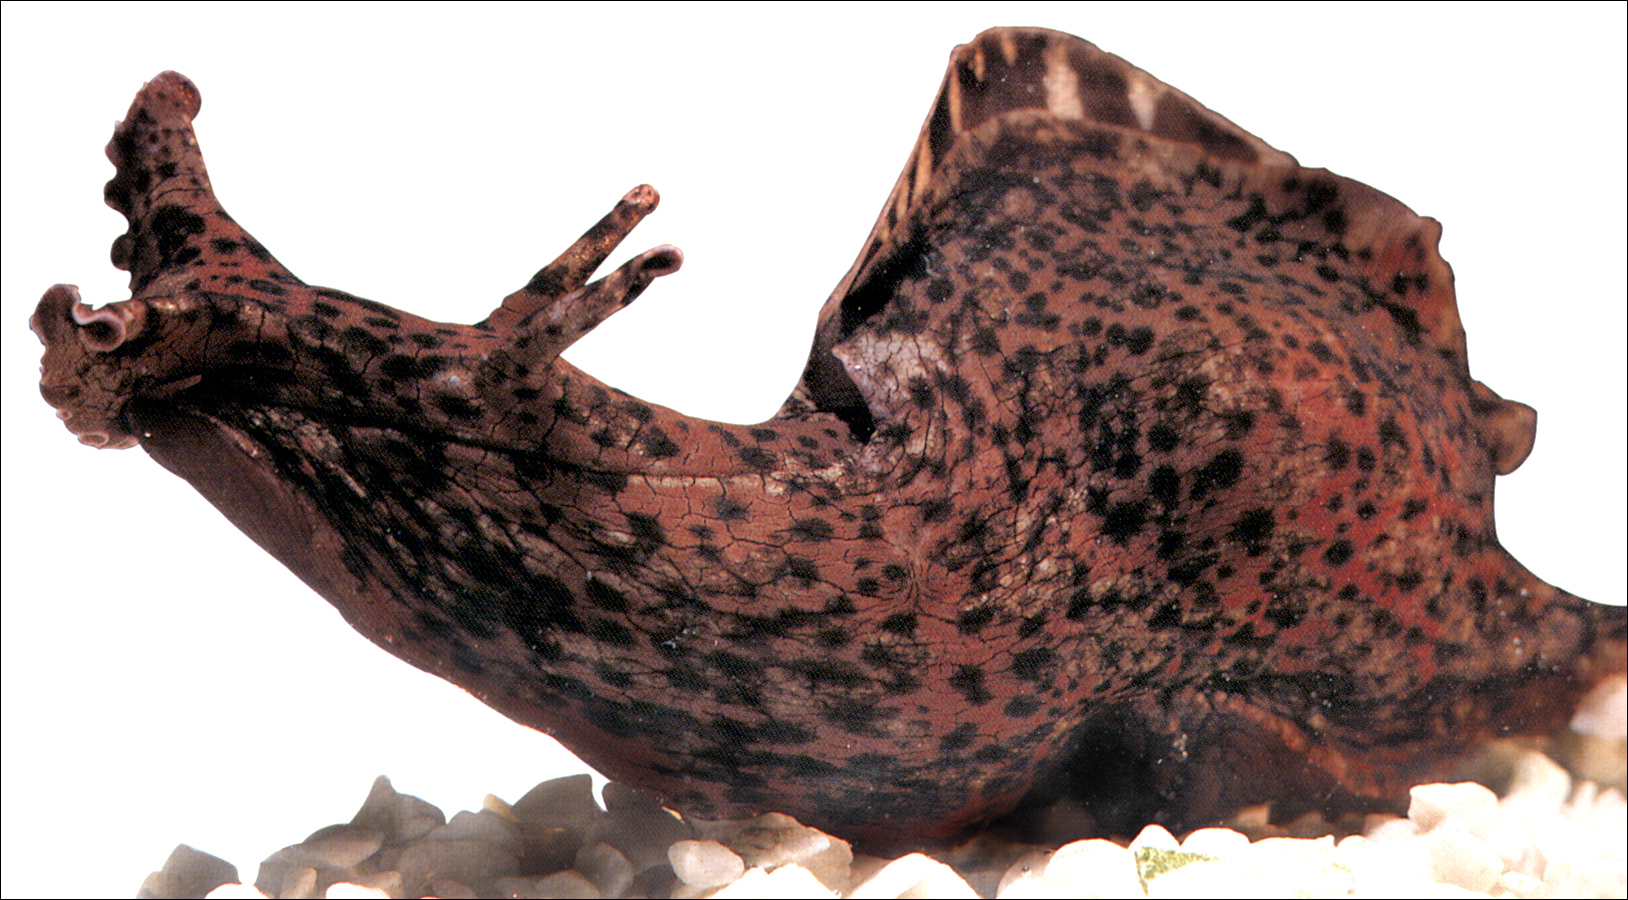 Aplysia Californica, better known as a sea slug